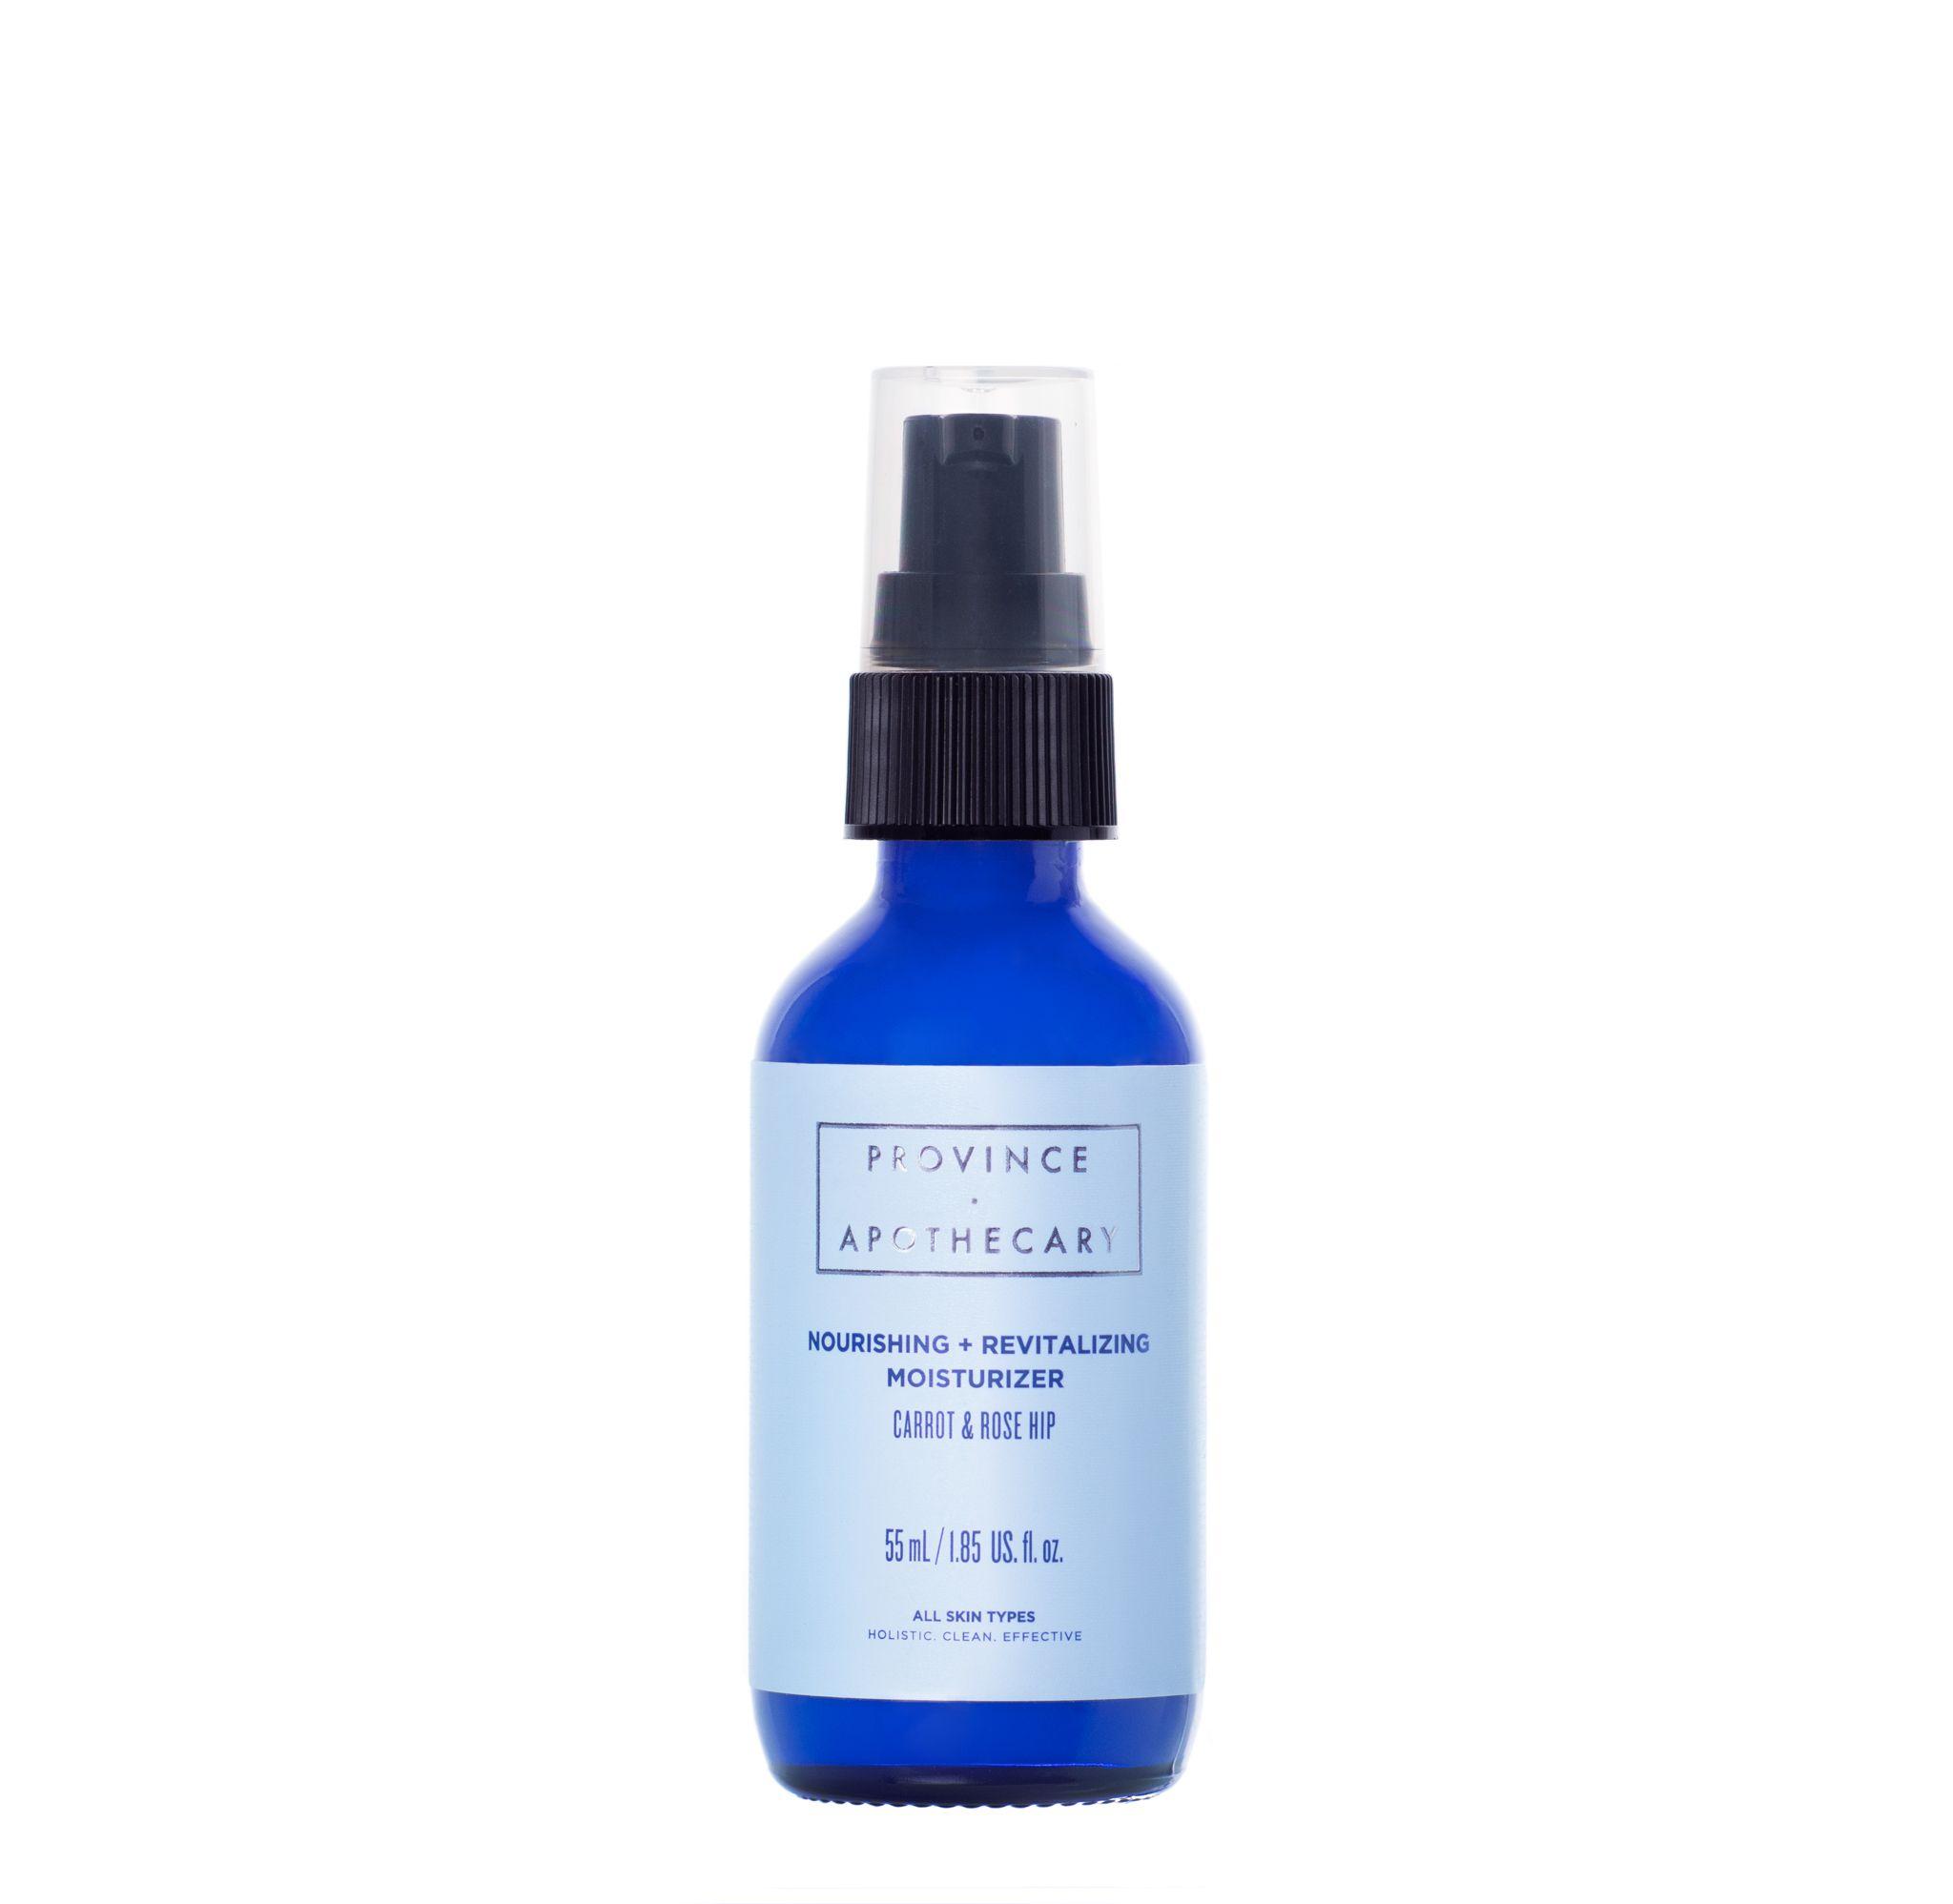 Nourishing + Revitalizing moisturizer